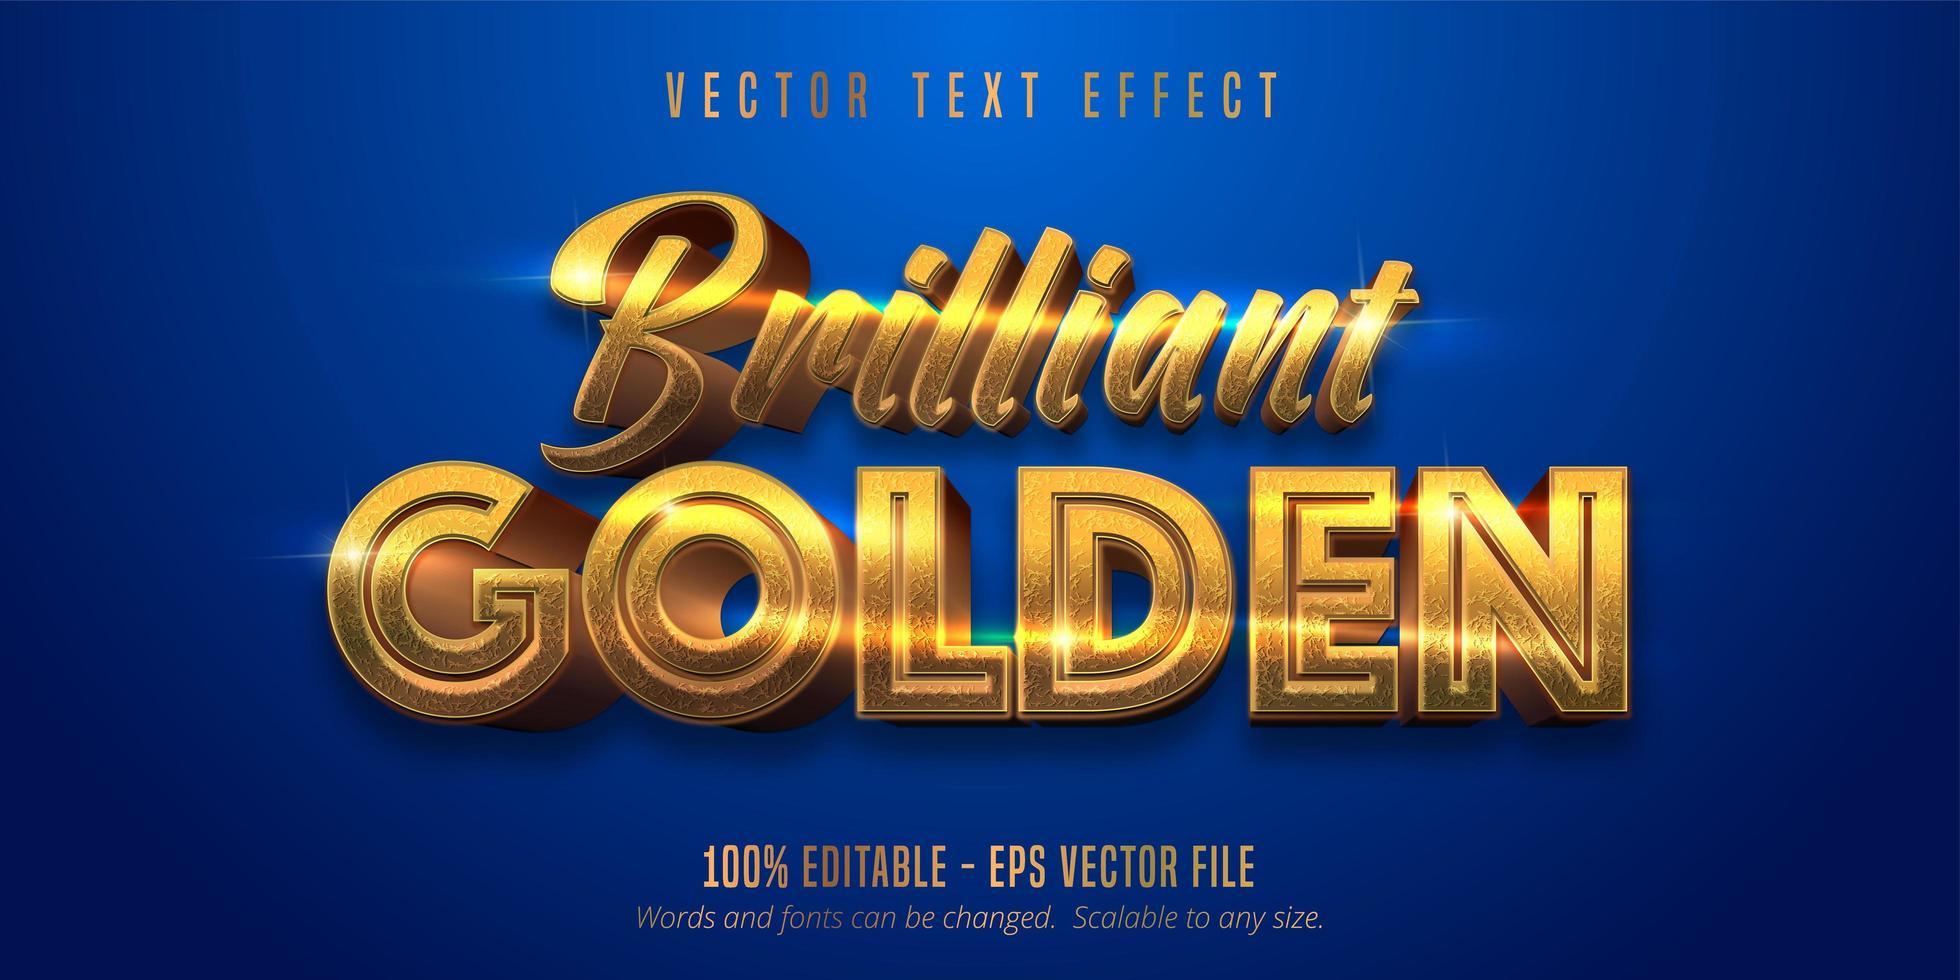 lysande gyllene glänsande guldstrukturerad texteffekt vektor